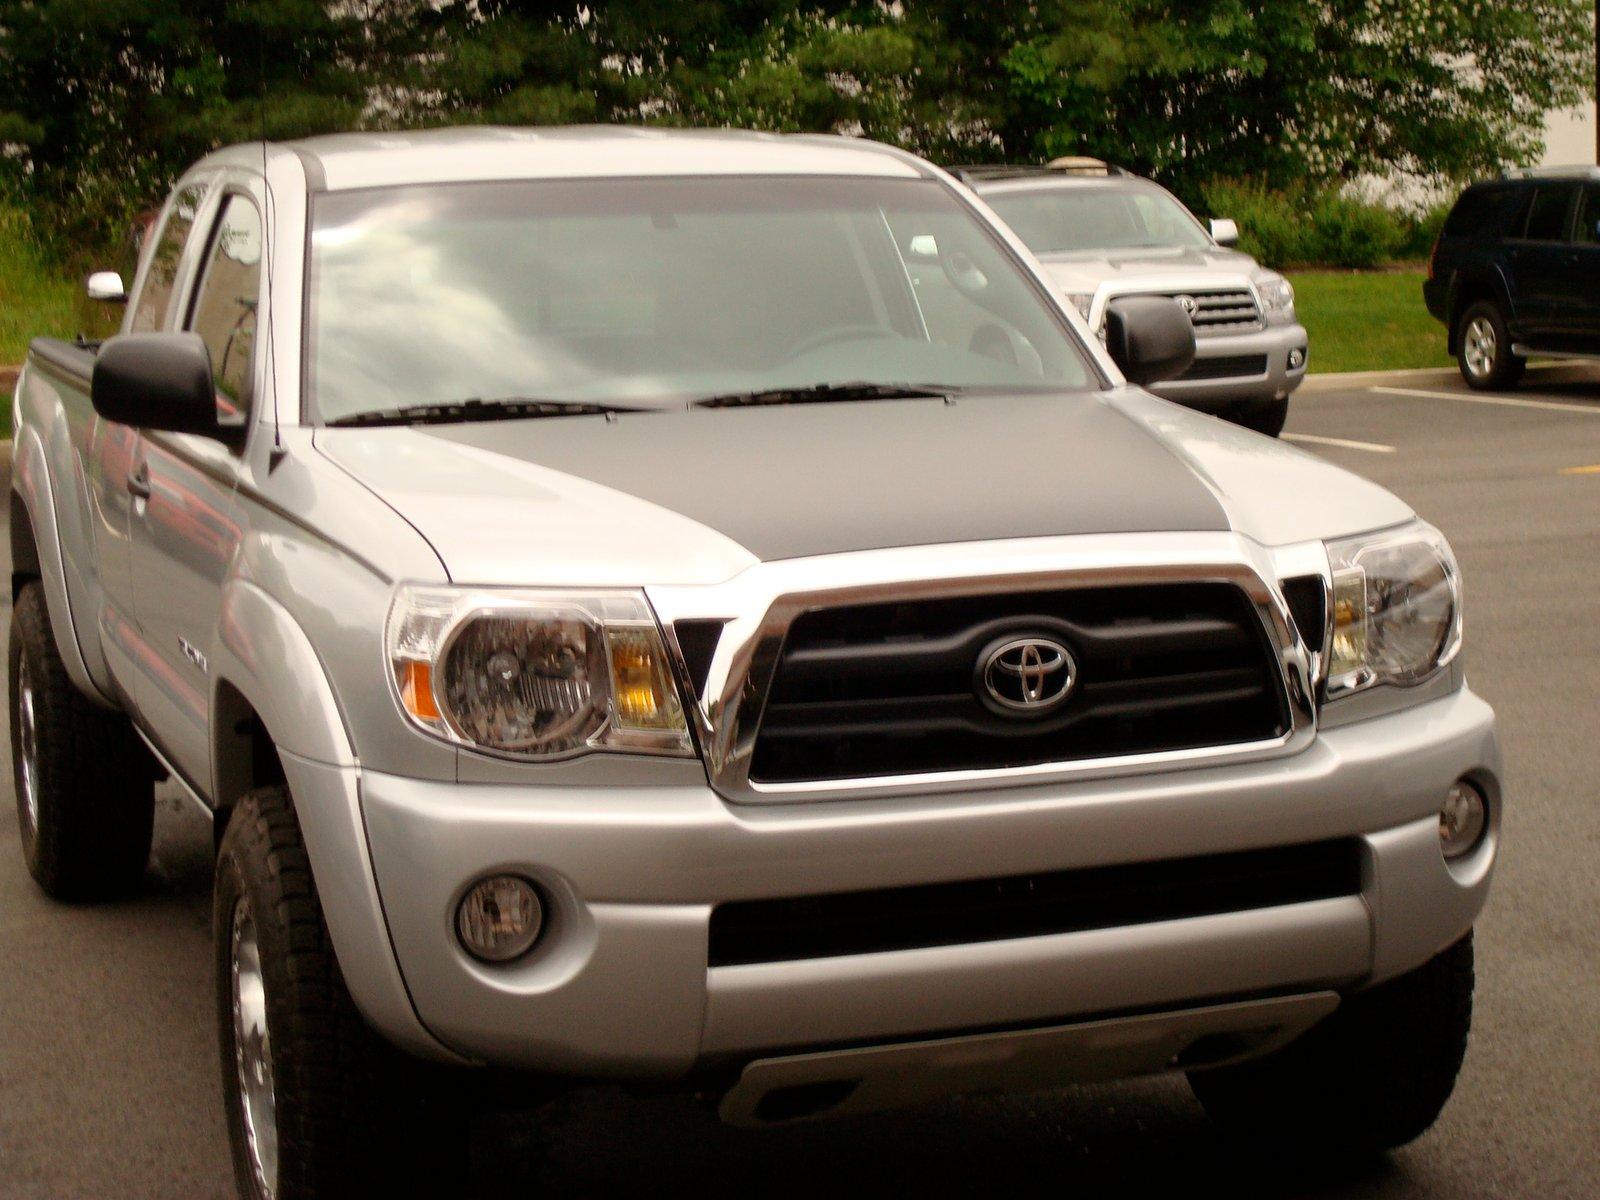 Toyota Tacoma Hood Blackout 2005-2011